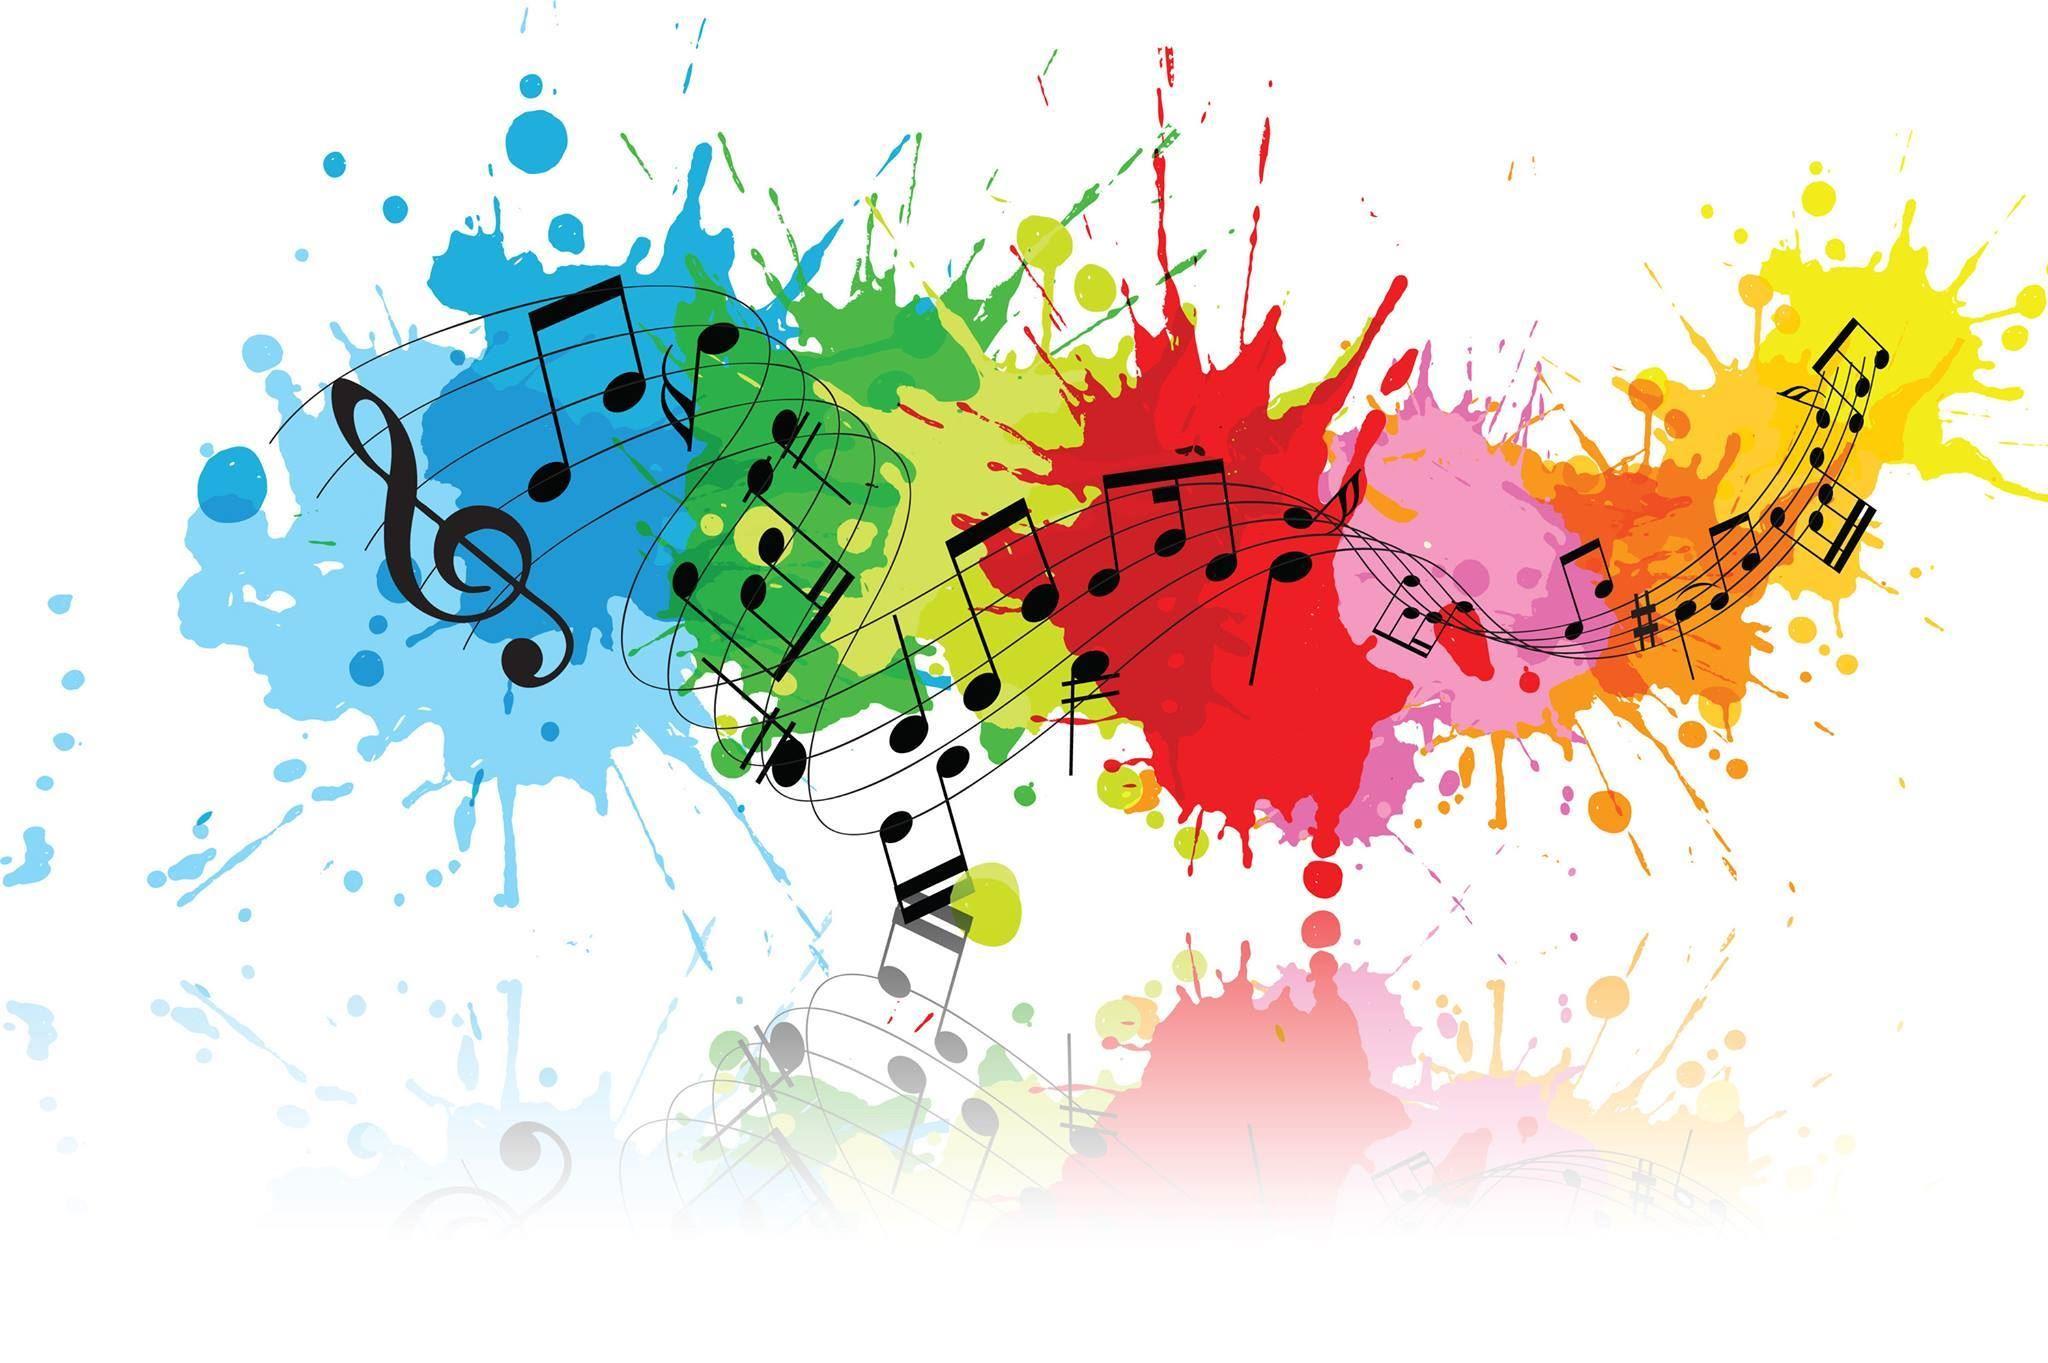 Musik i sommarkvällen